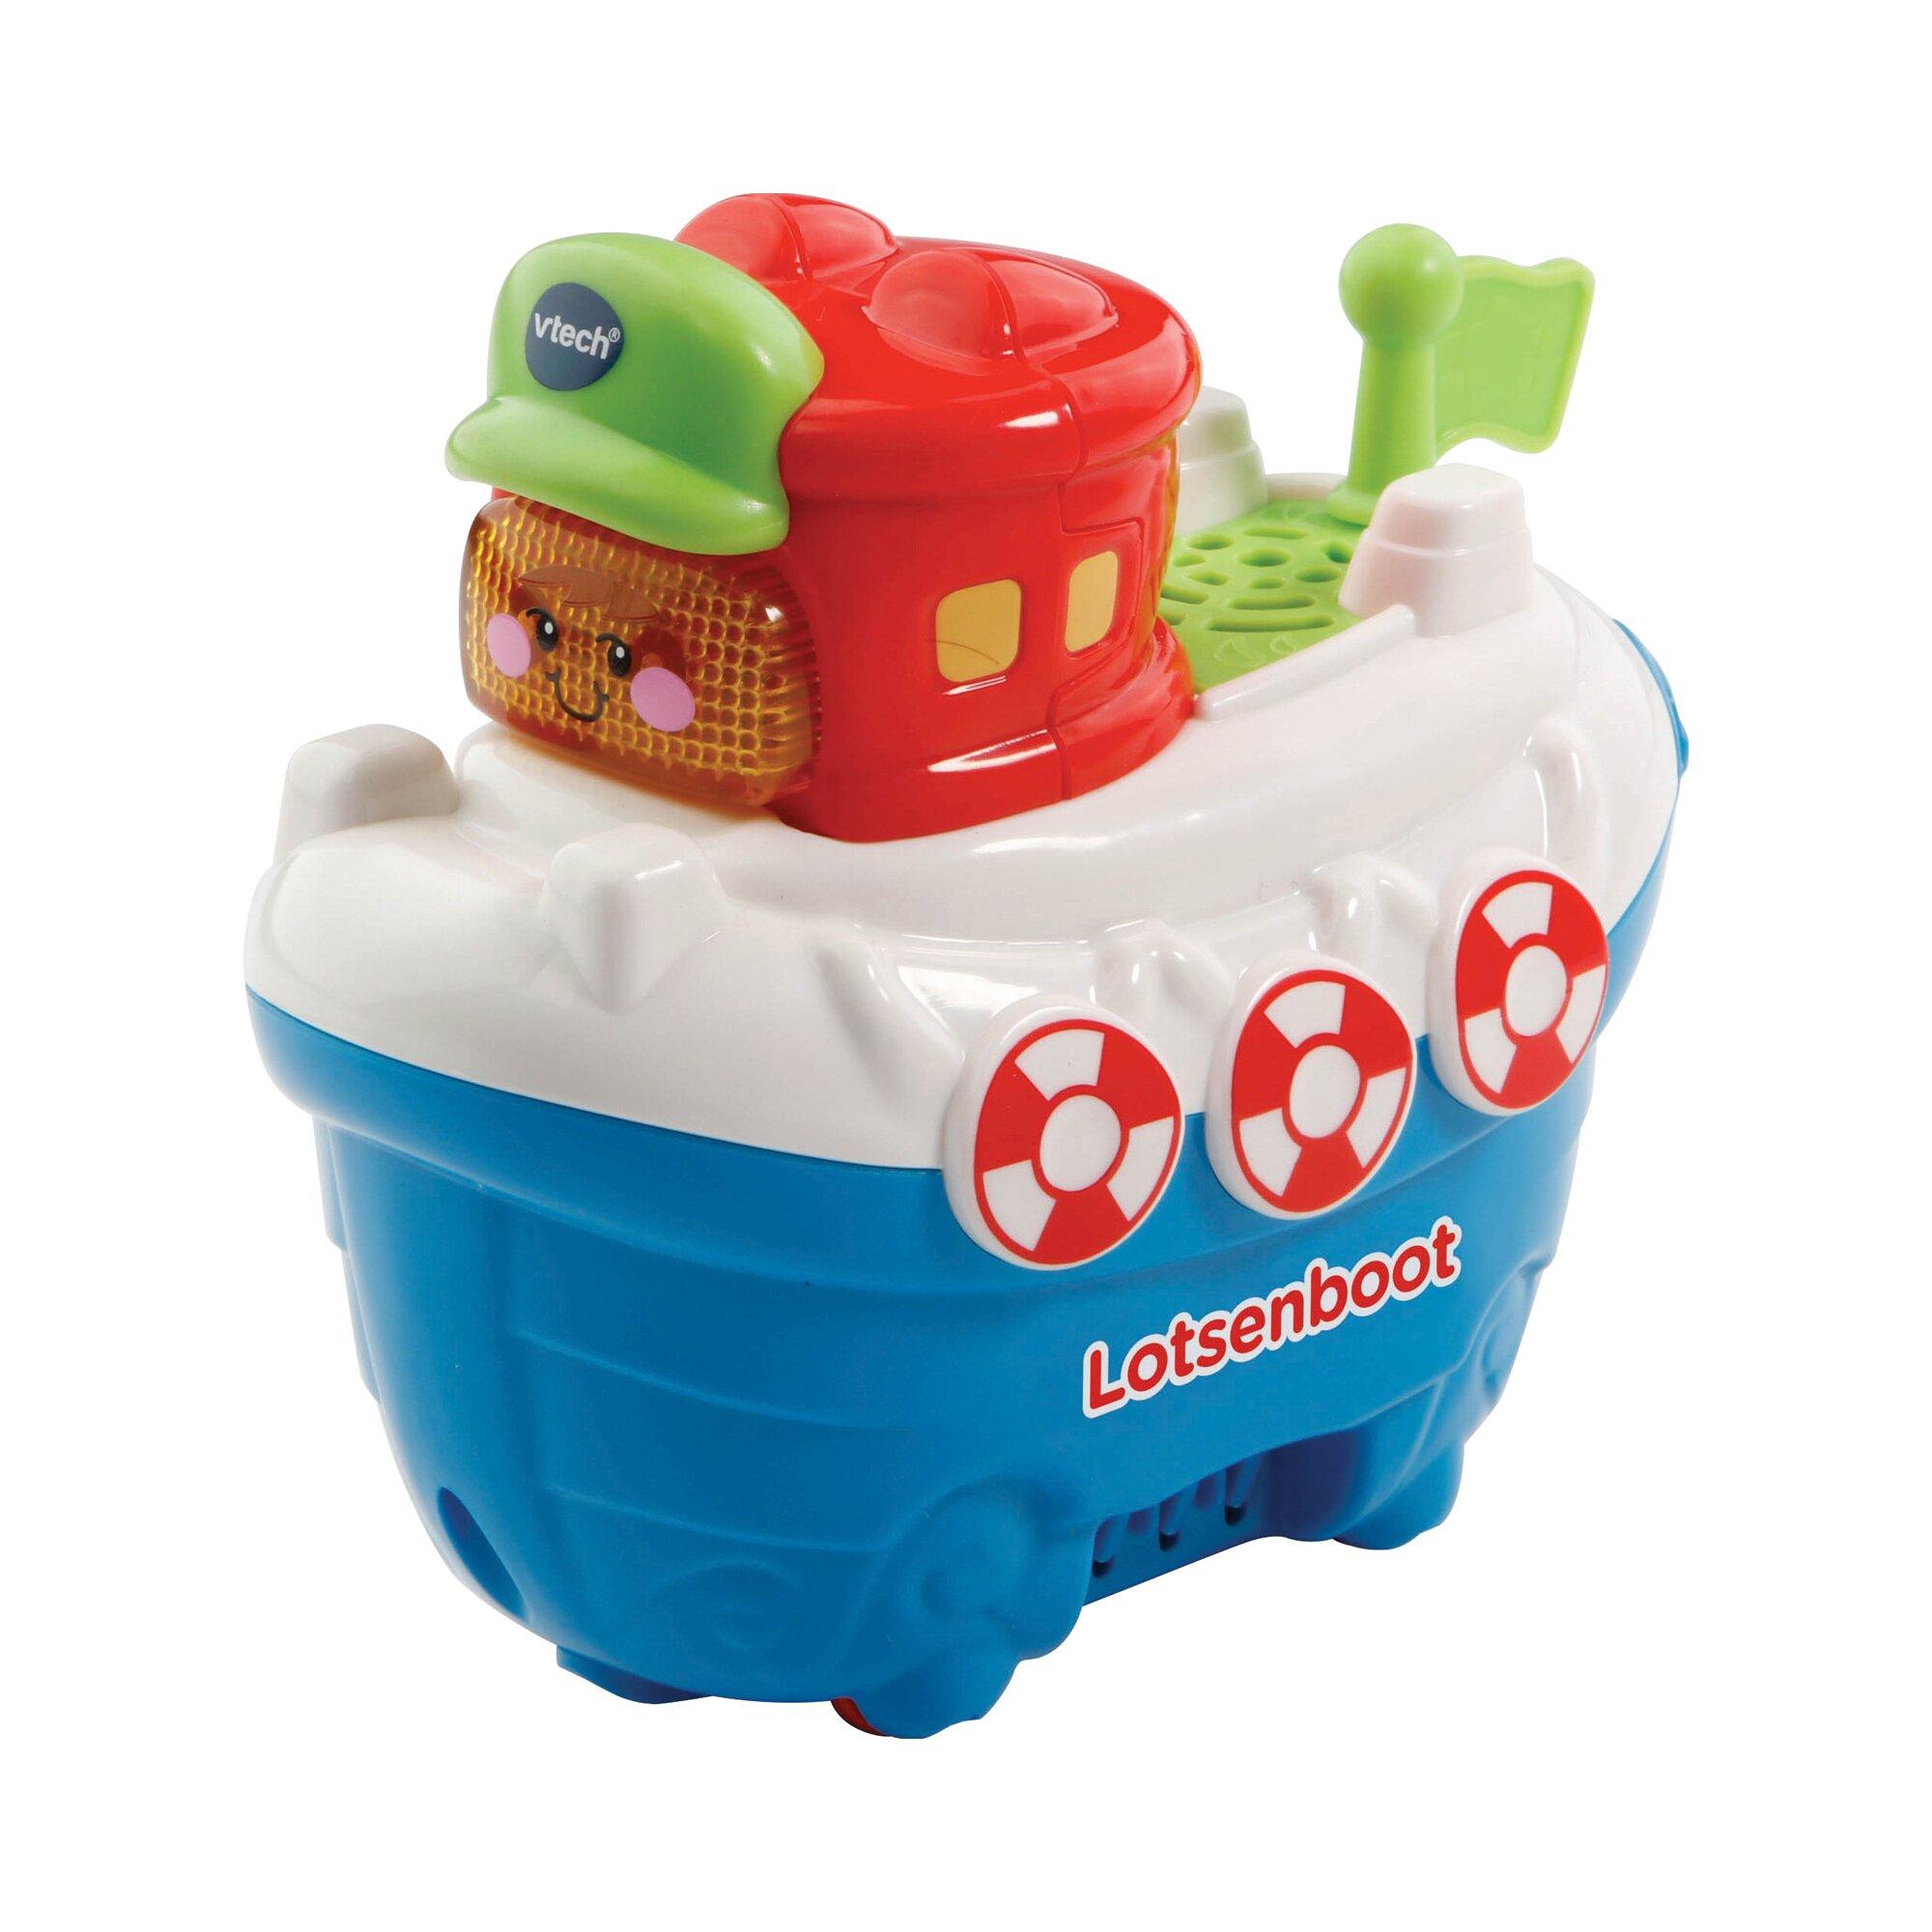 tut-tut-baby-badewelt-badespielzeug-lotsenboot-mit-freunden